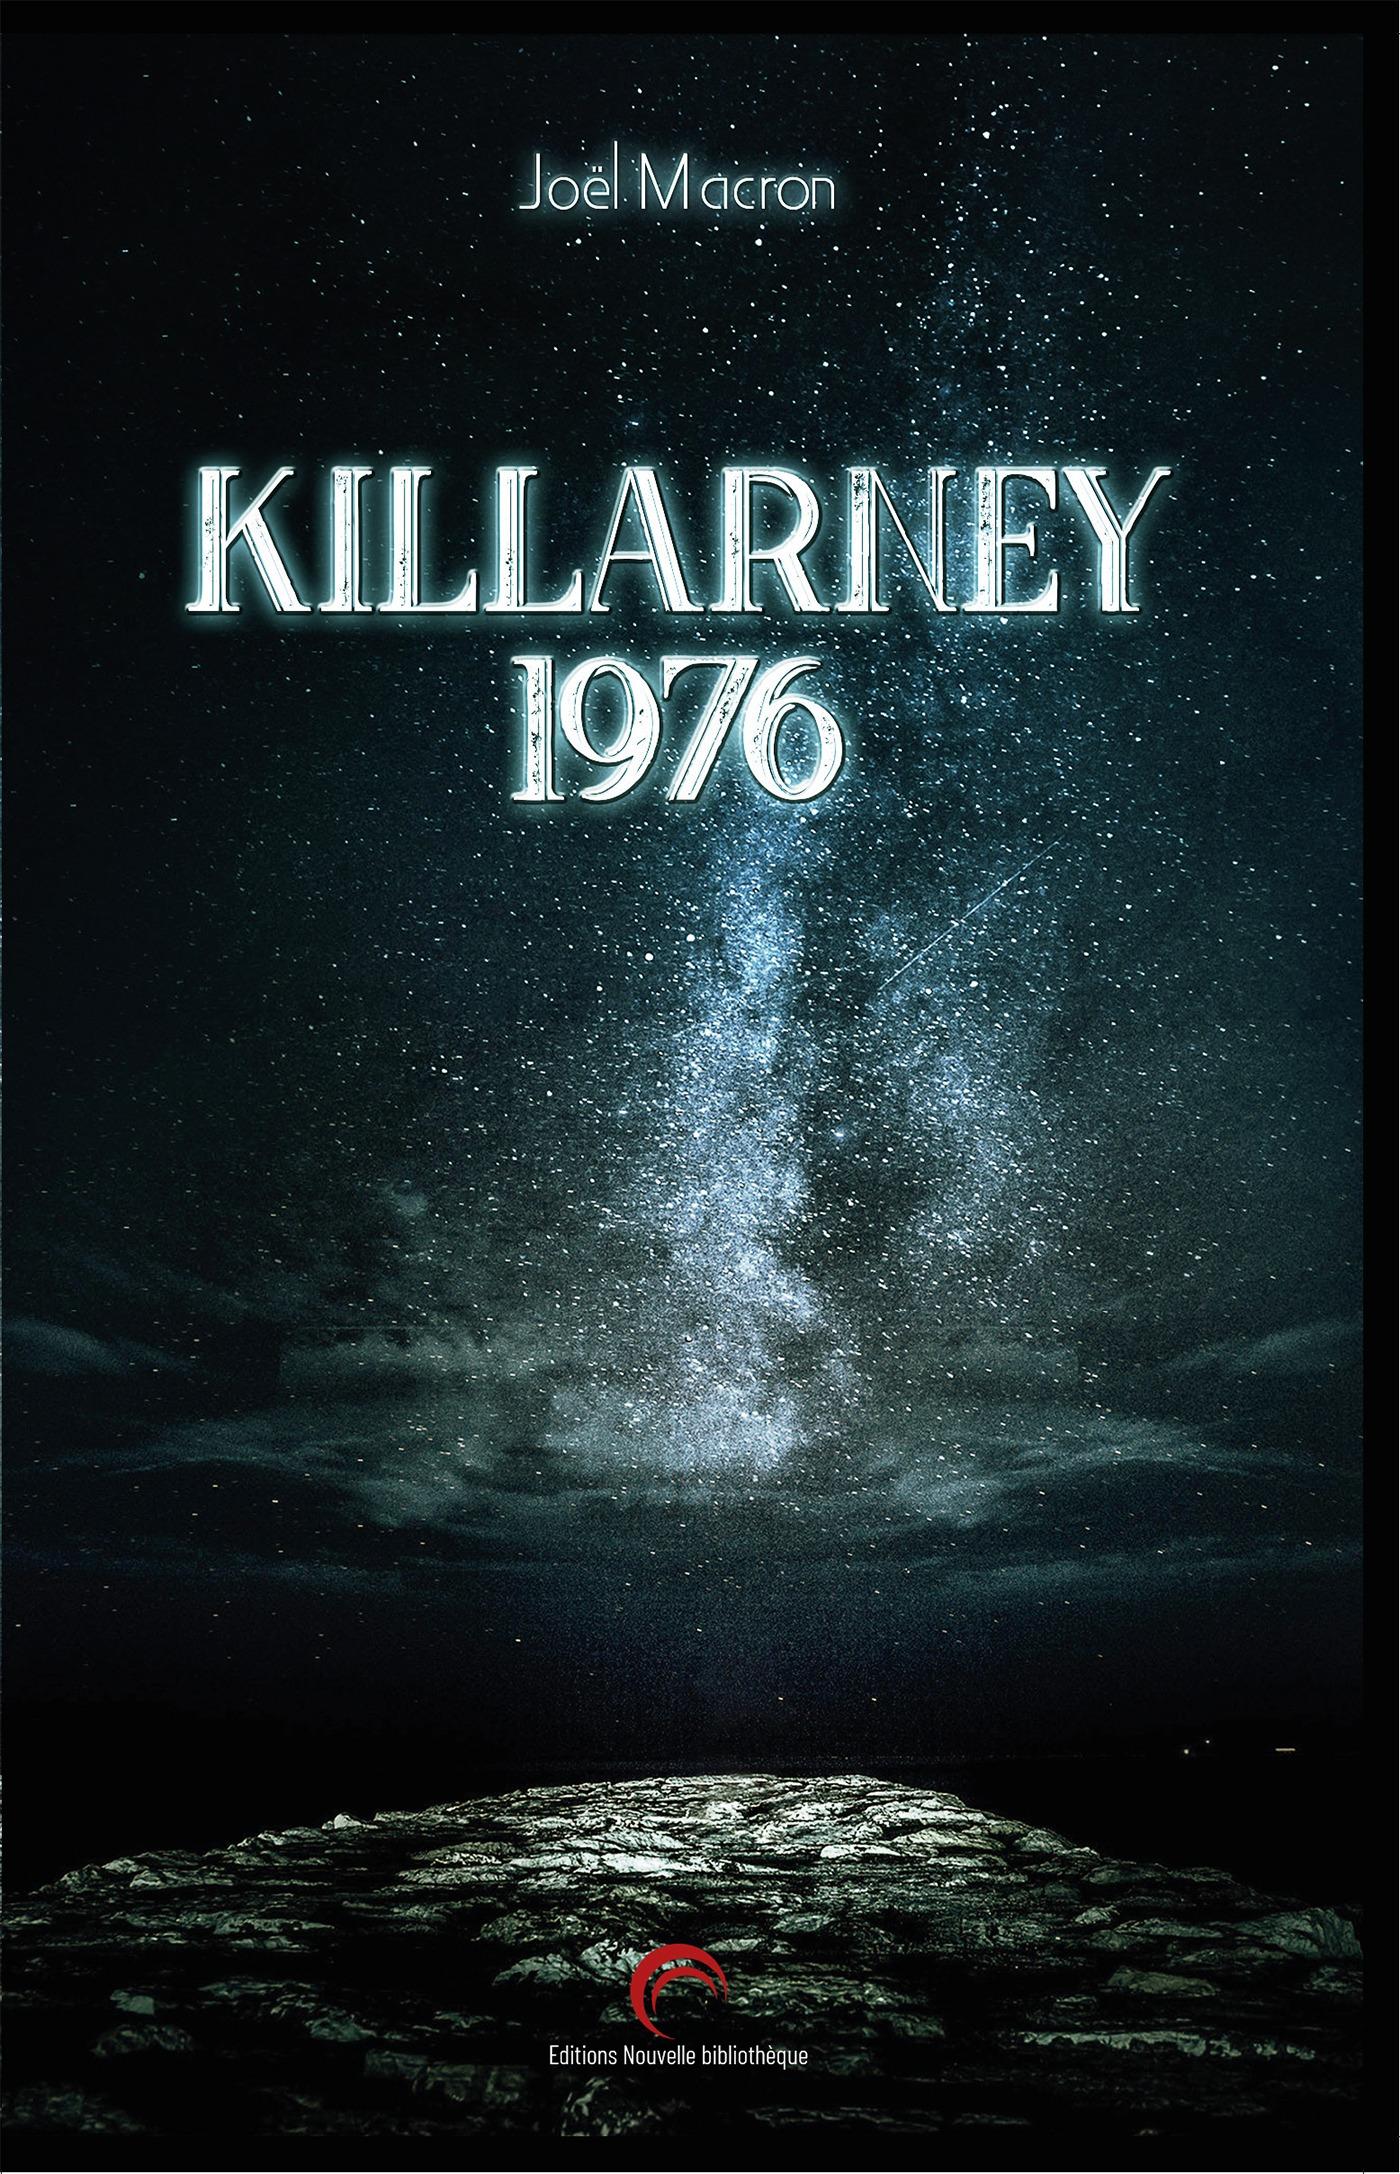 Killarney 1976